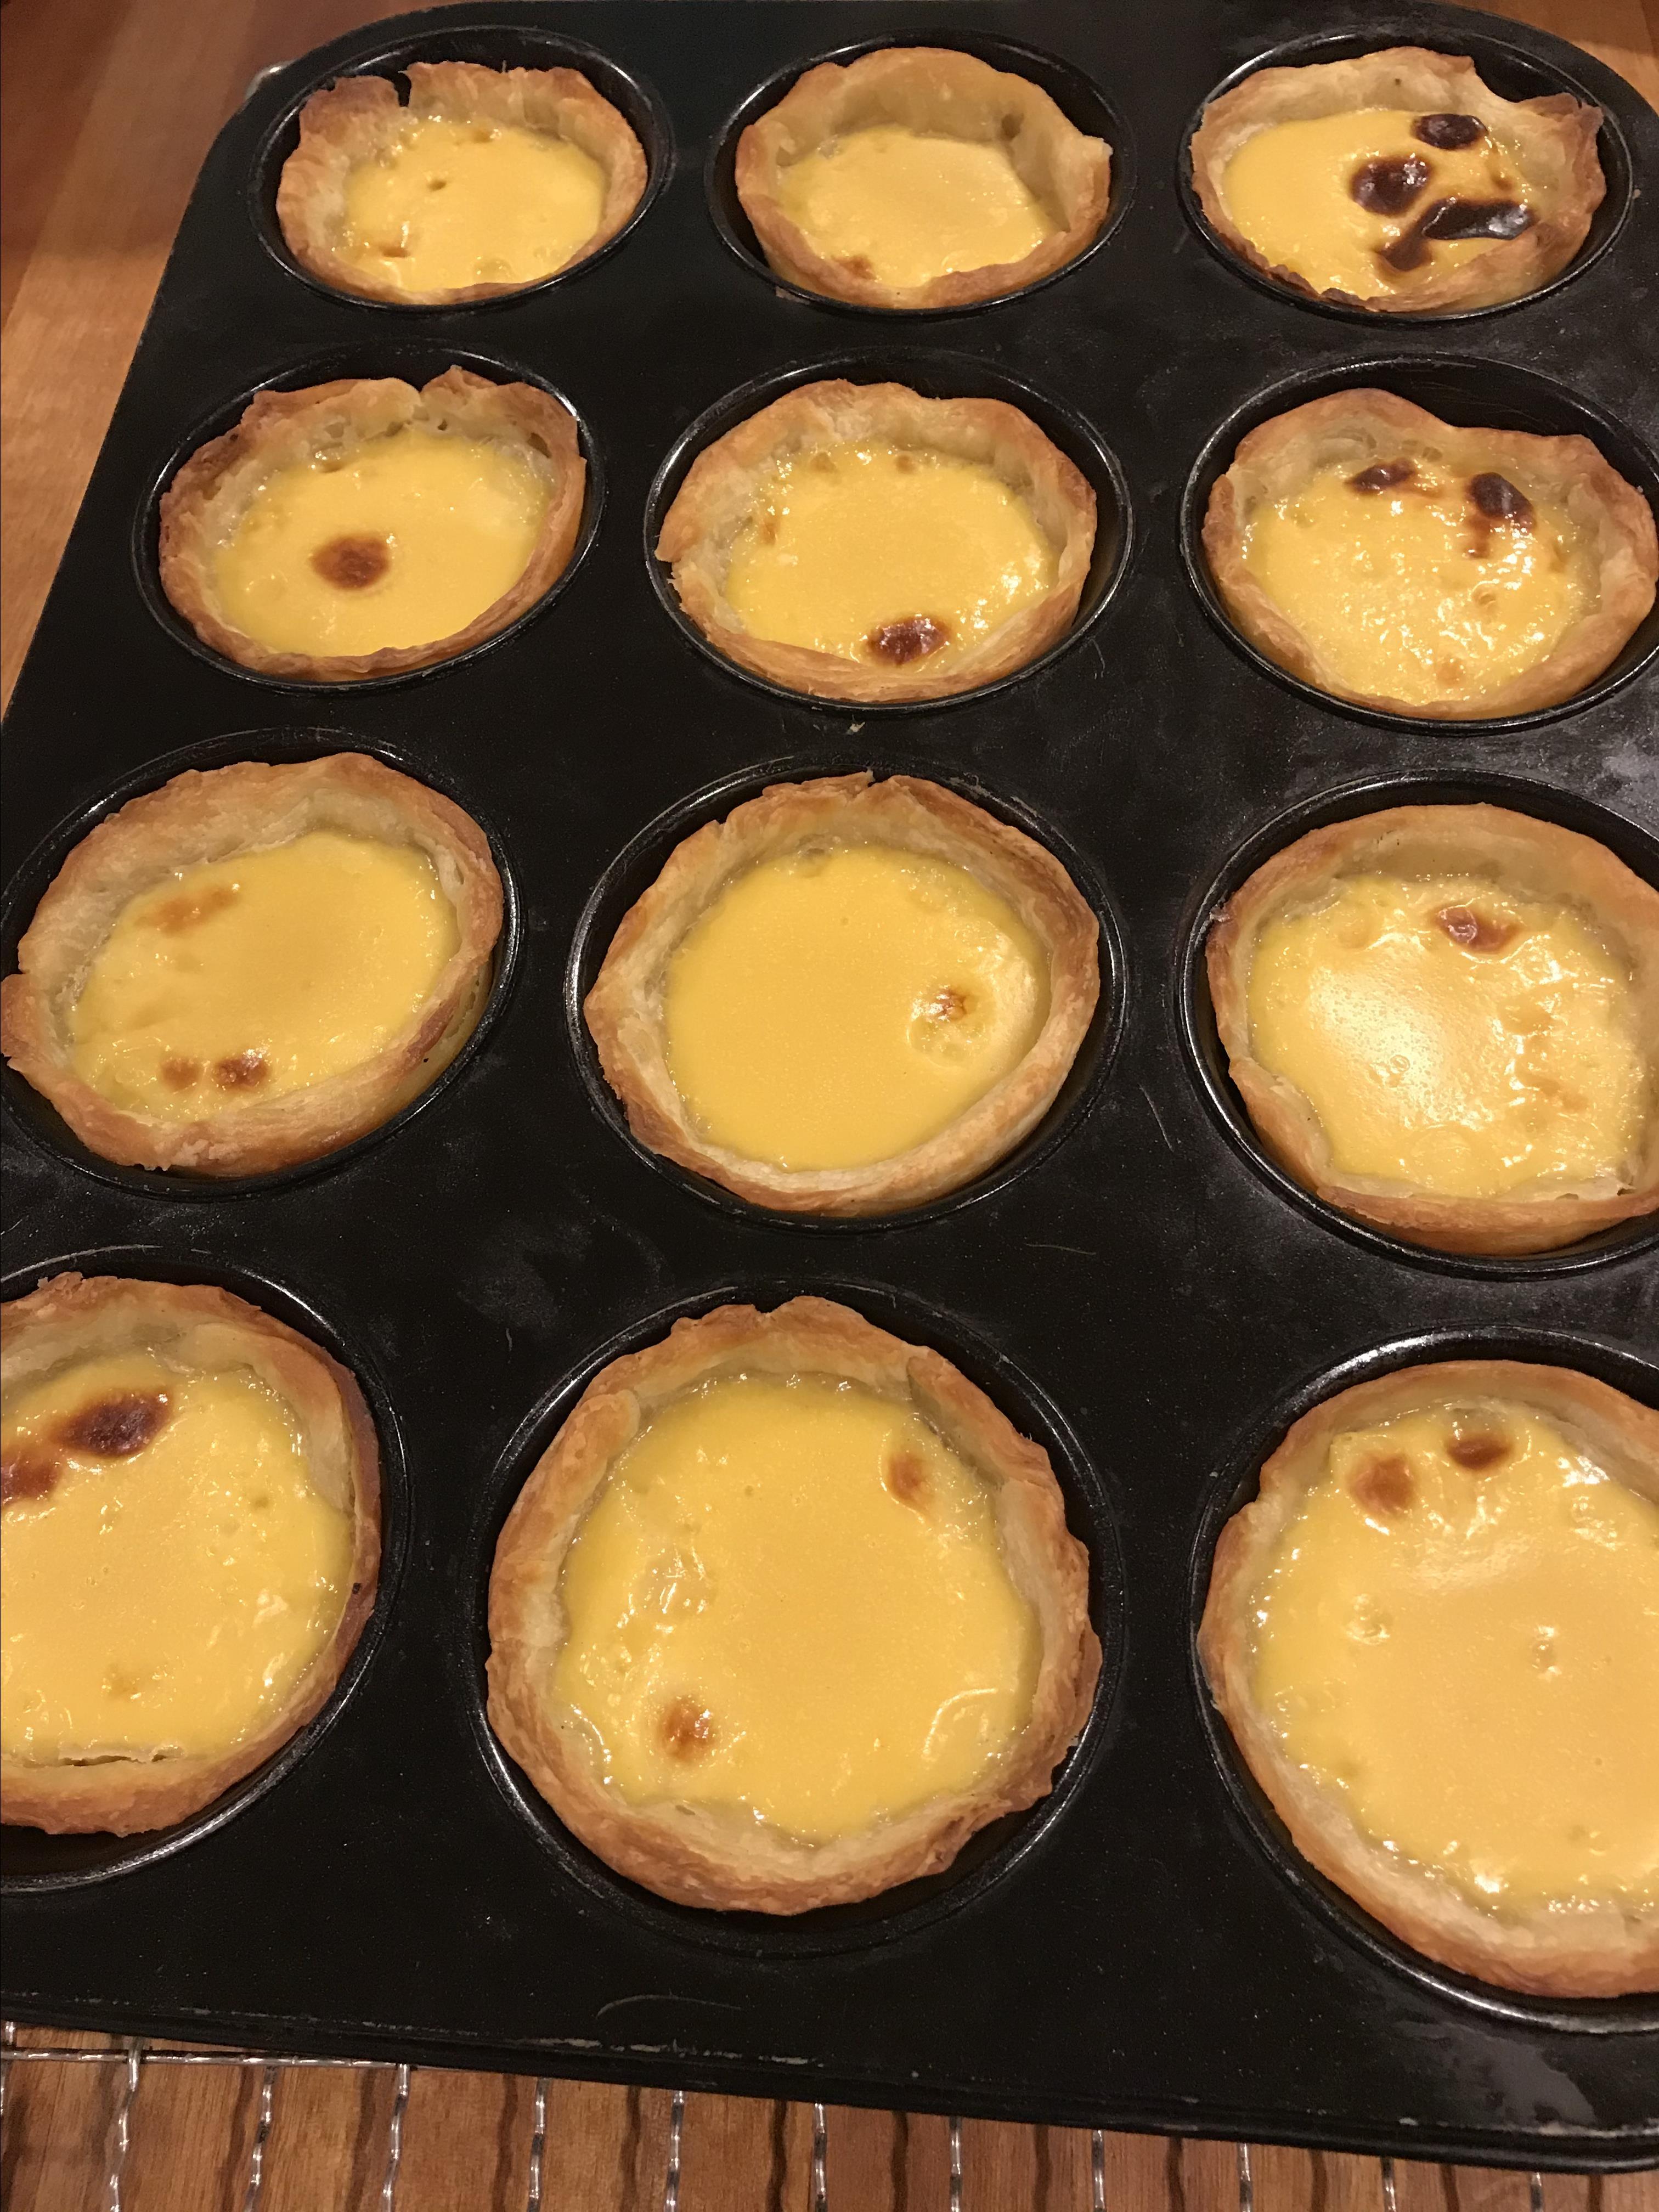 Portuguese Custard Tarts (Pasteis de Nata)